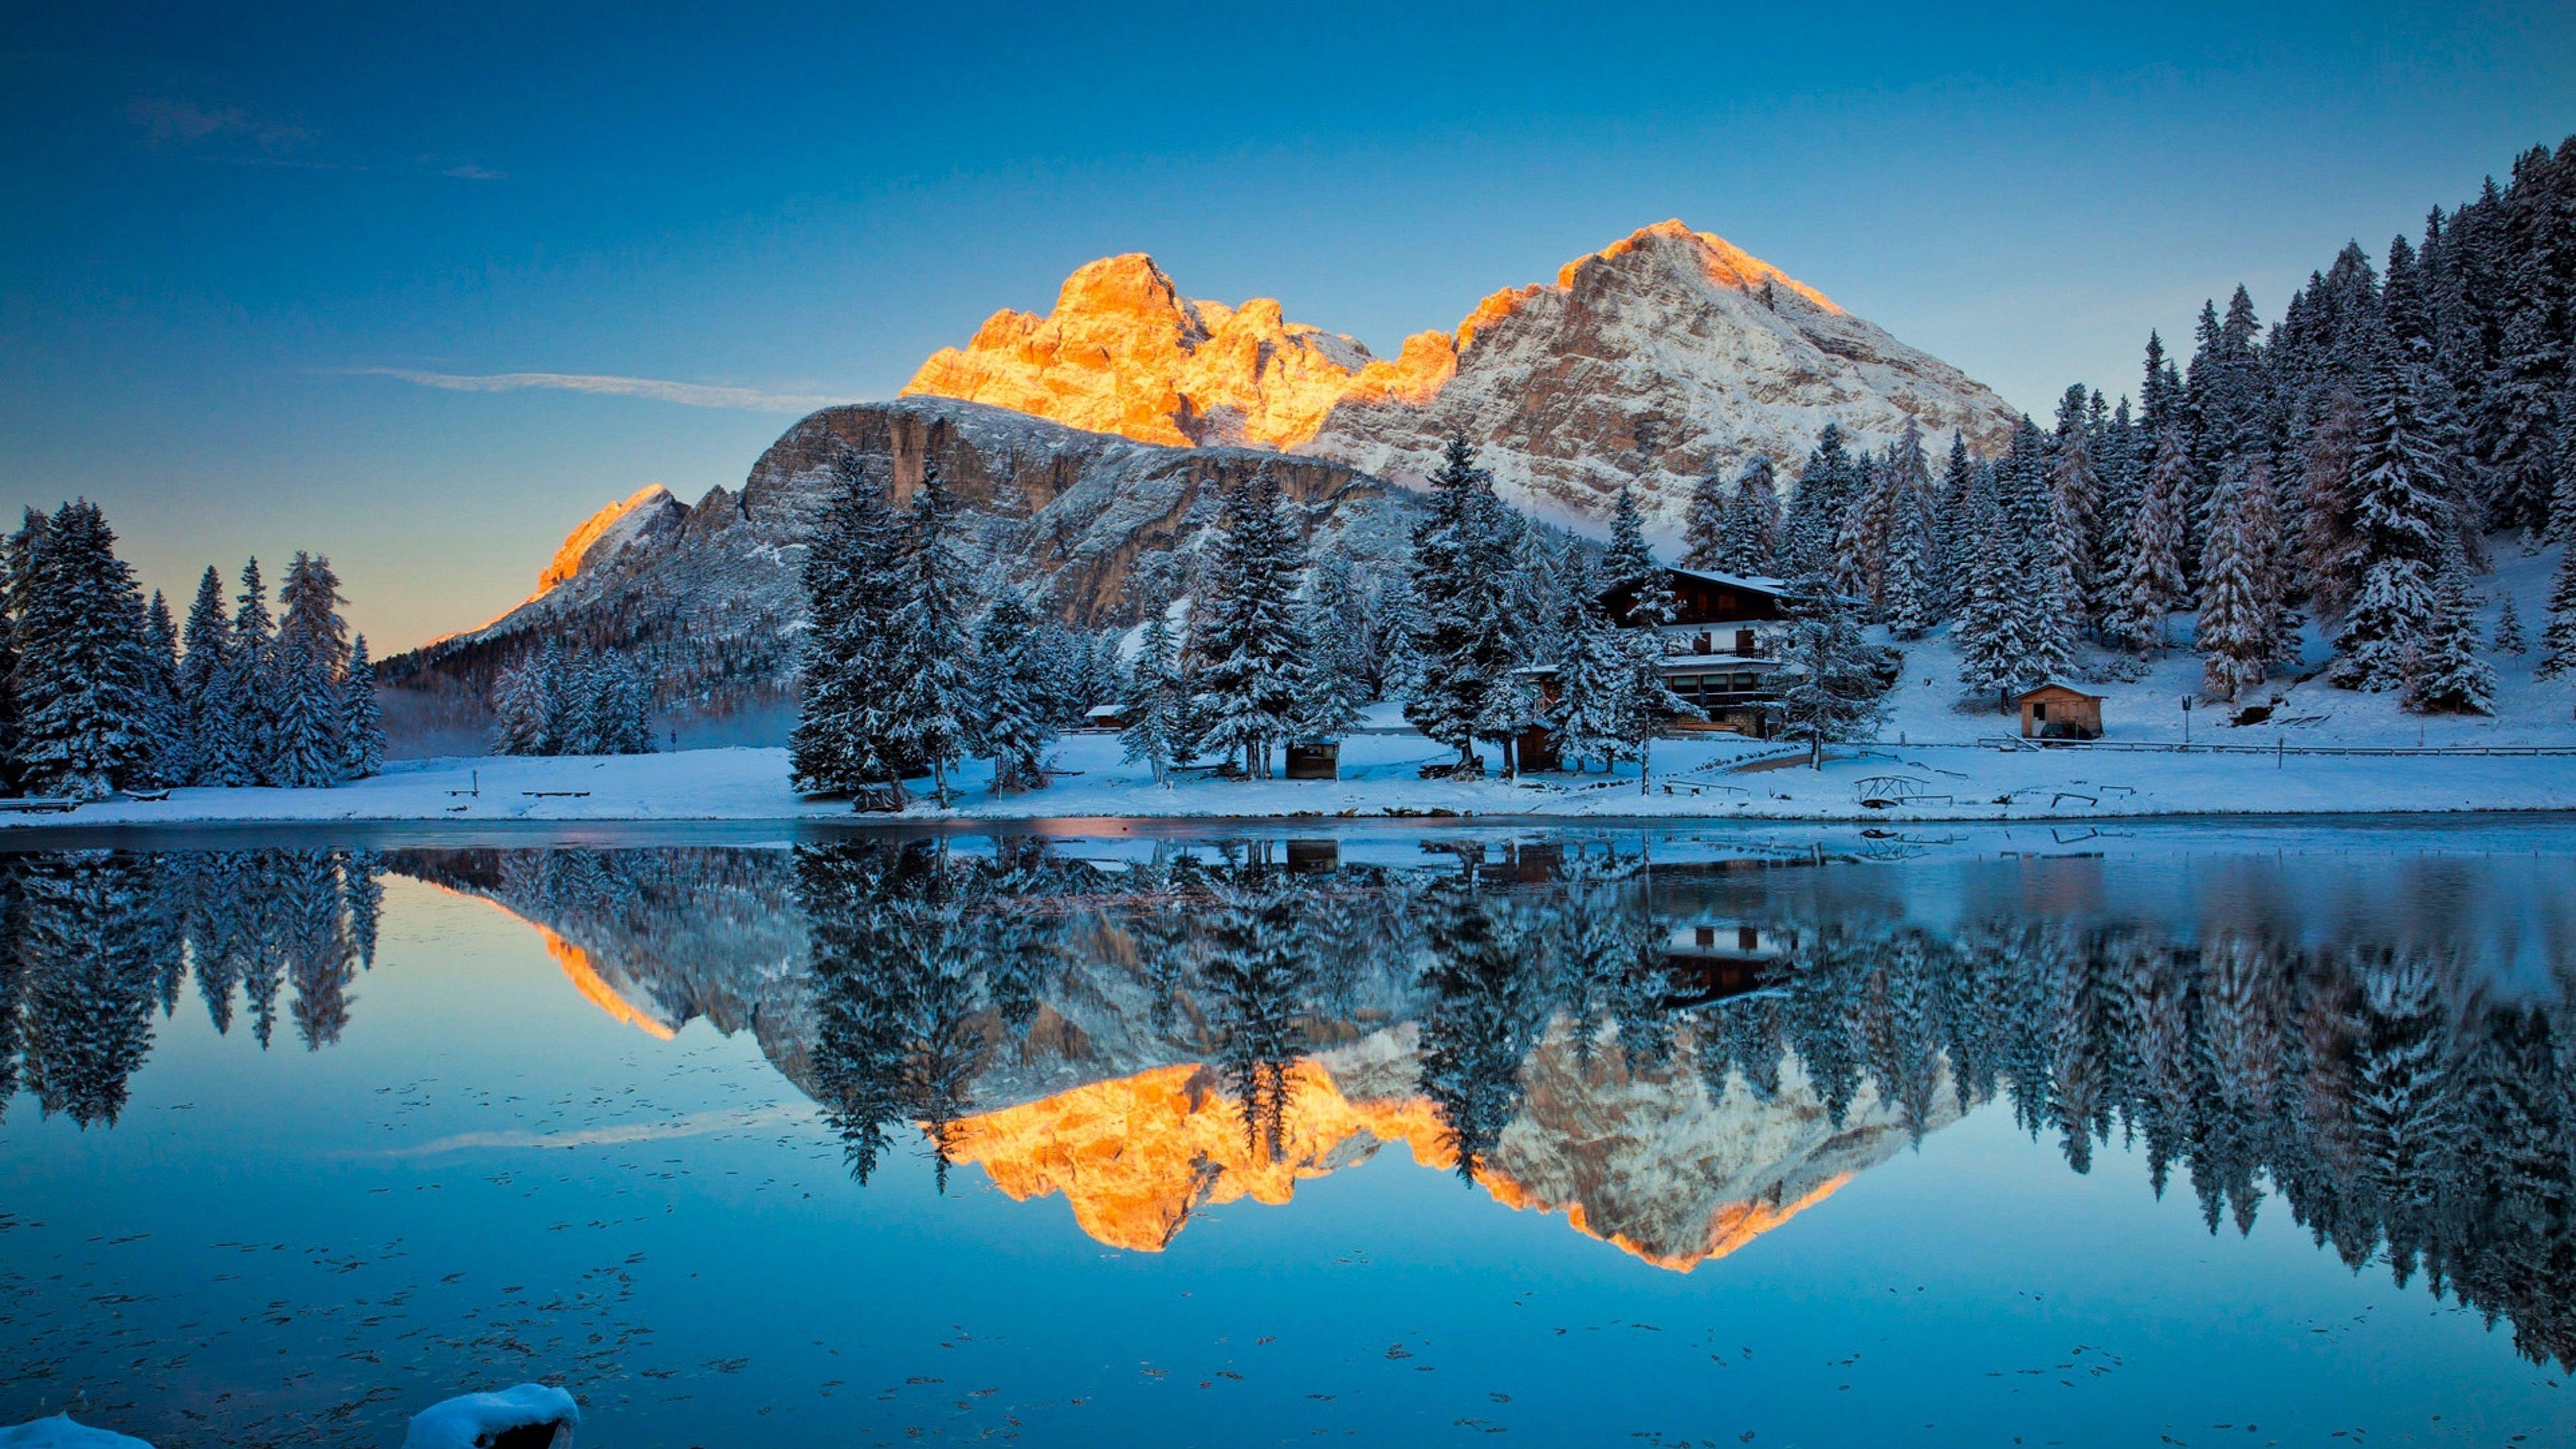 8k Mountain Wallpapers Top Free 8k Mountain Backgrounds Wallpaperaccess